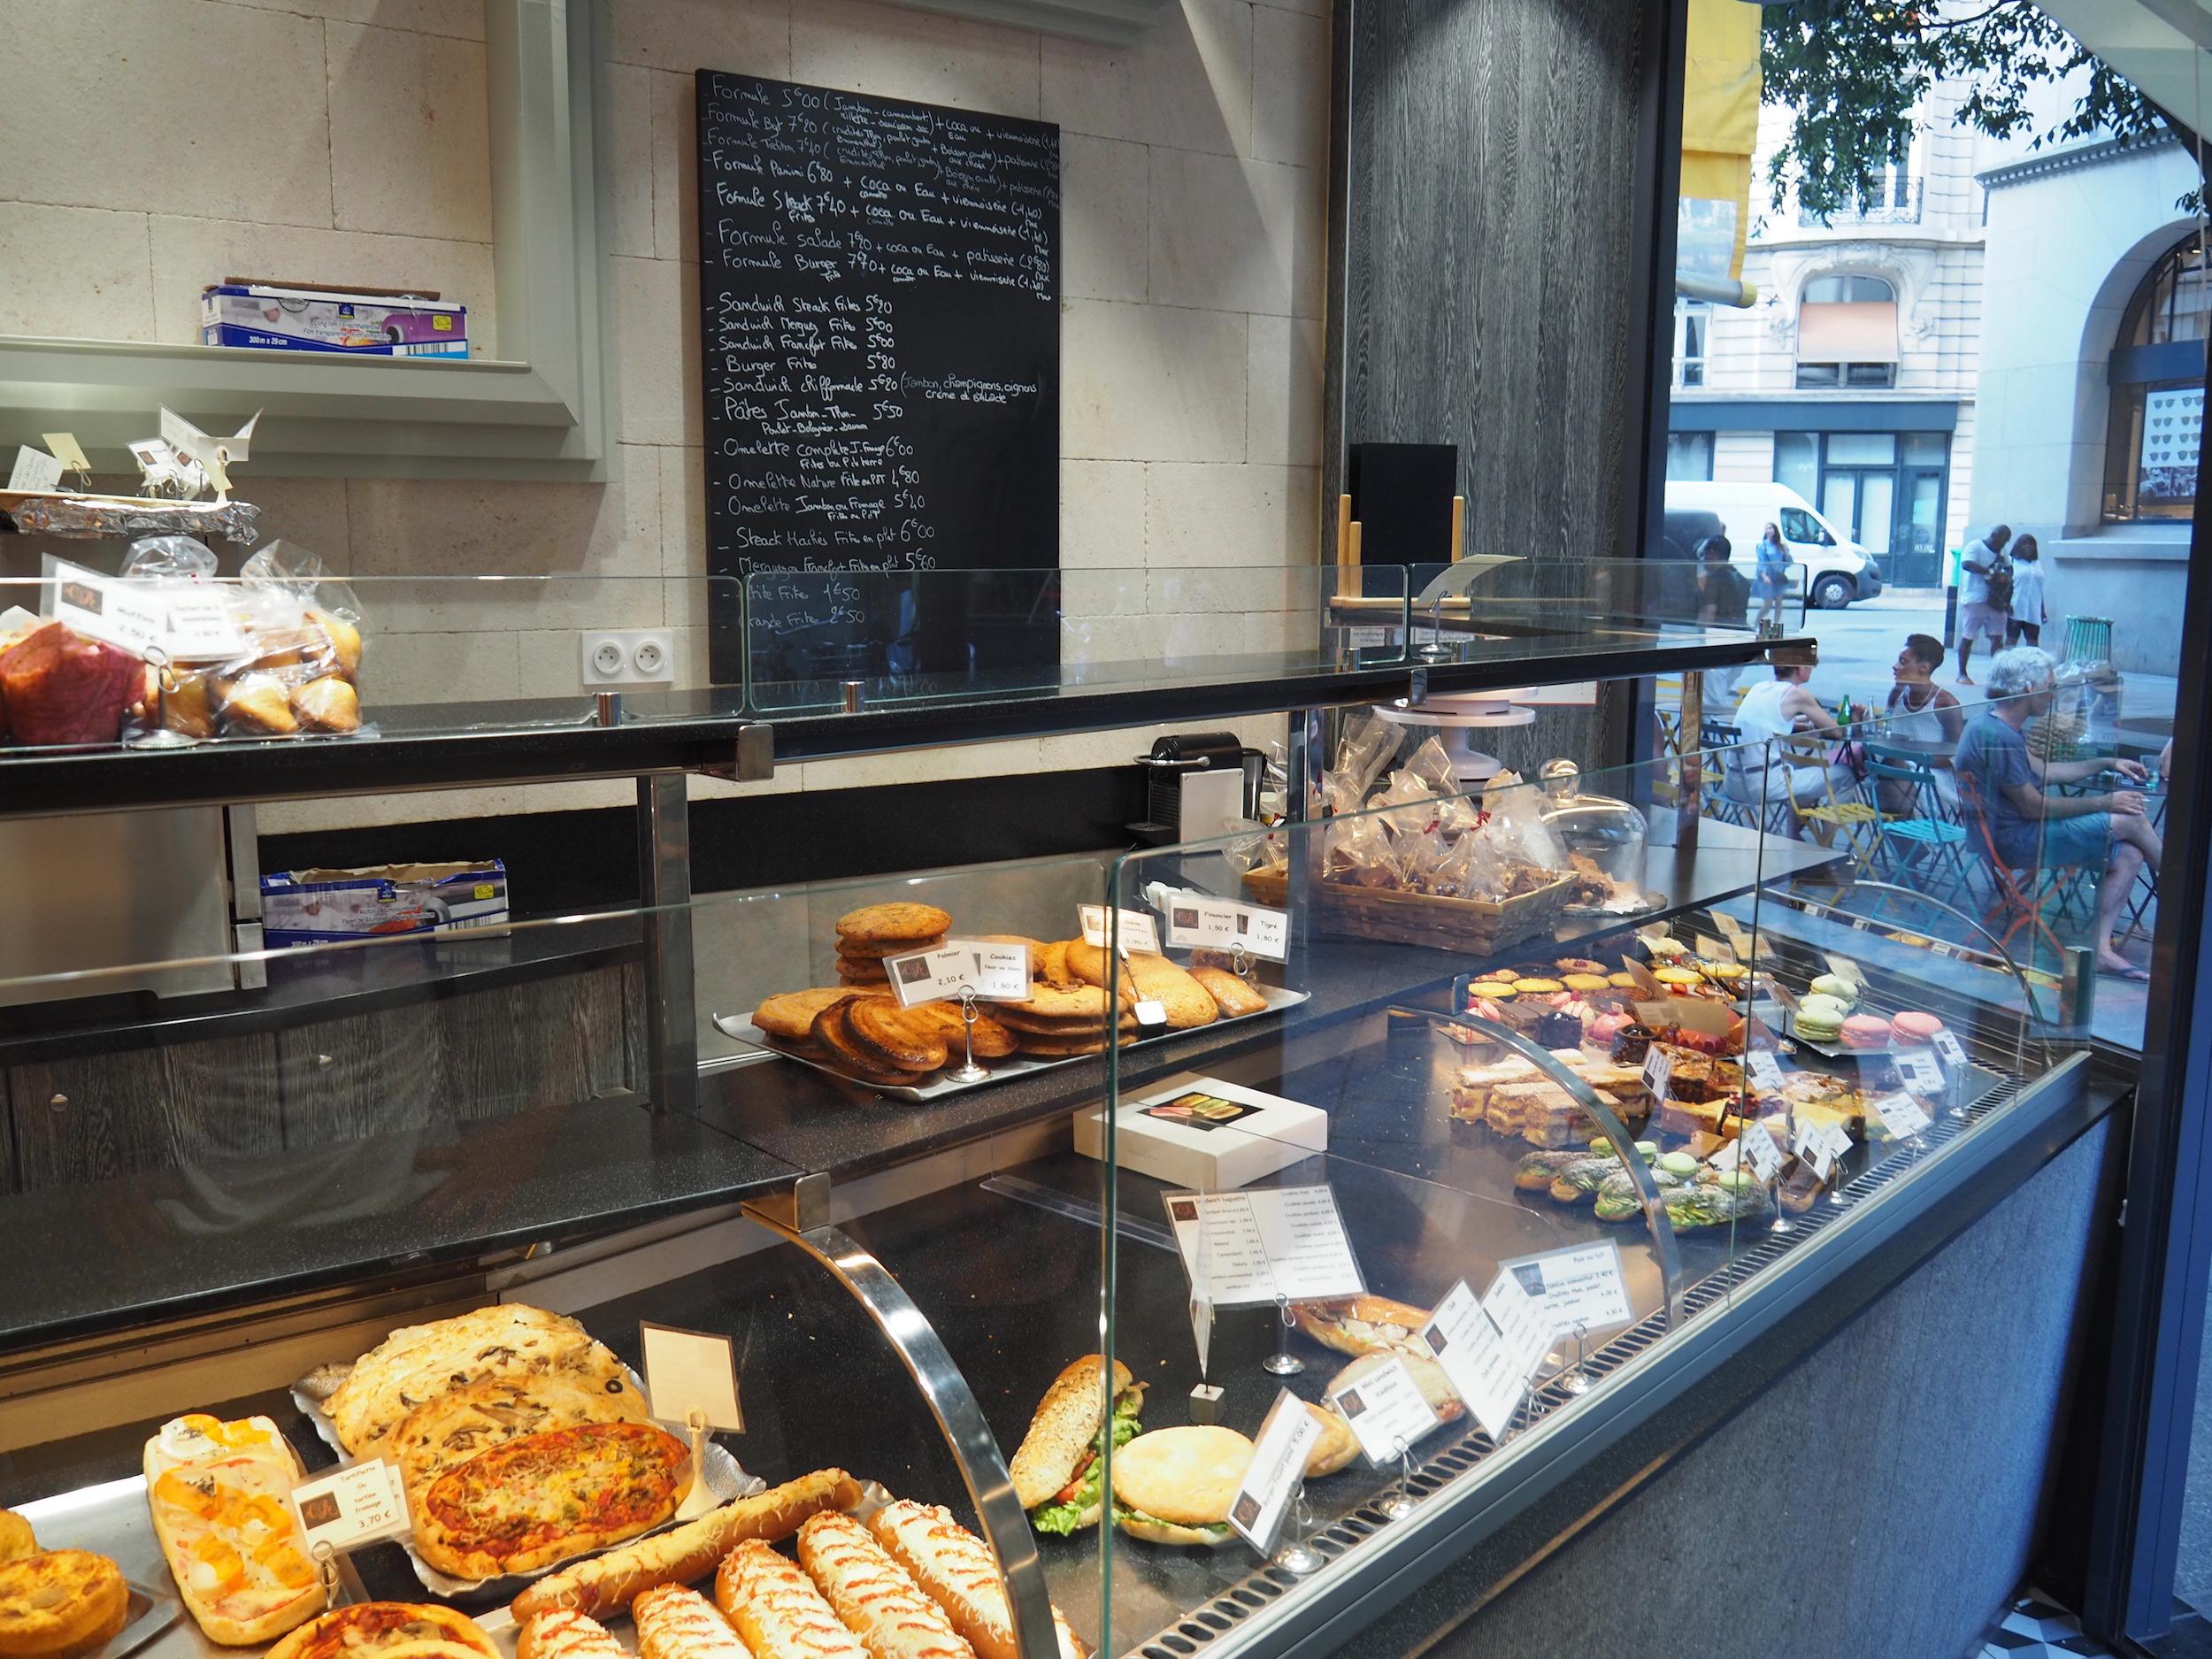 Colin Regis bakery patisserie